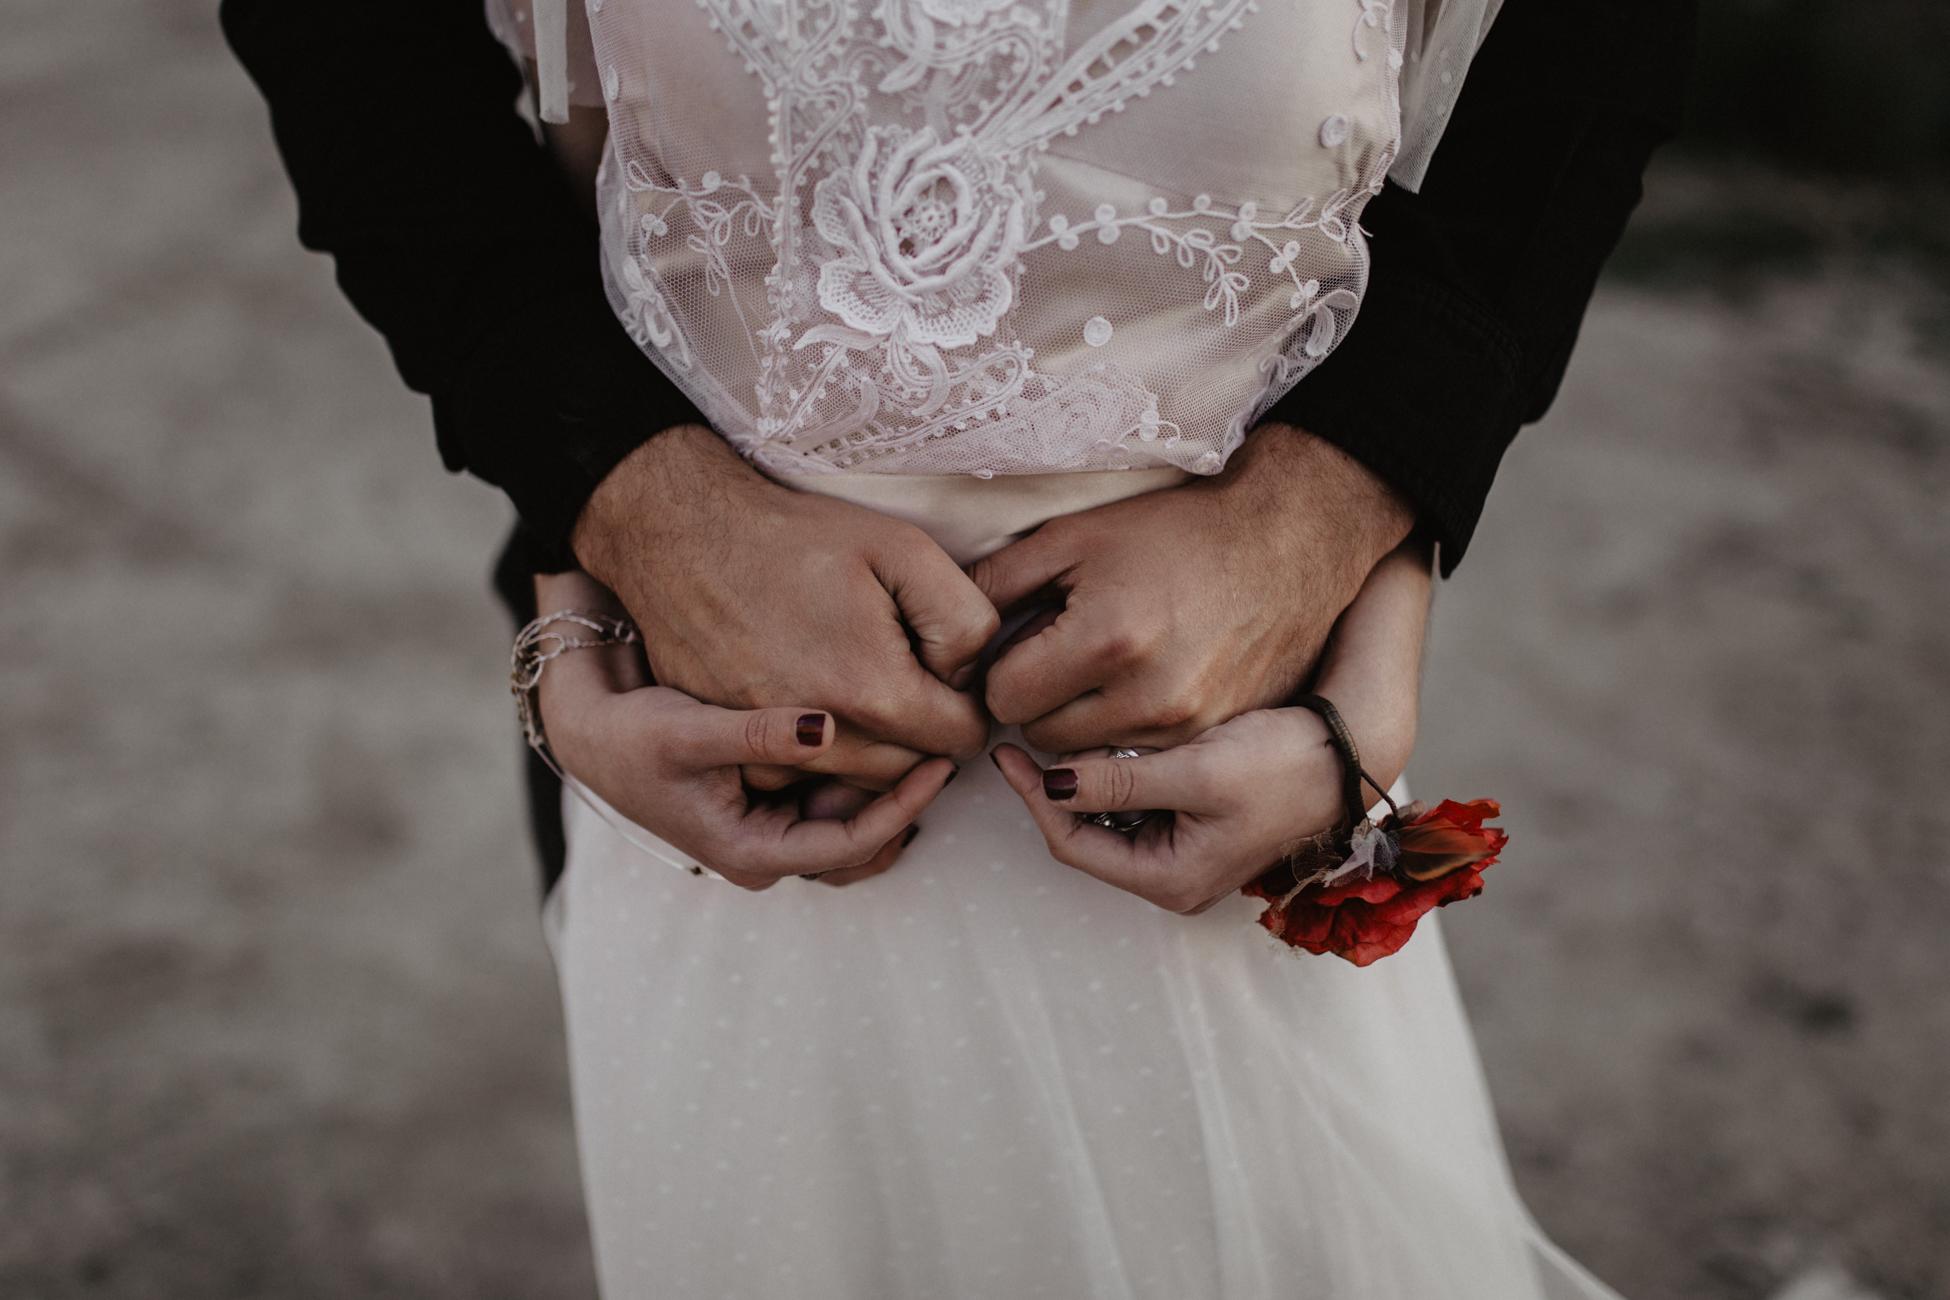 thenortherngirlphotography_photography_thenortherngirl_rebeccascabros_wedding_weddingphotography_weddingphotographer_wood_muebles_deco_bodasdecaramelo_home_bedtime_gaywedding_editorial_desierto_desert_wildestdreams_amortexano-316.jpg